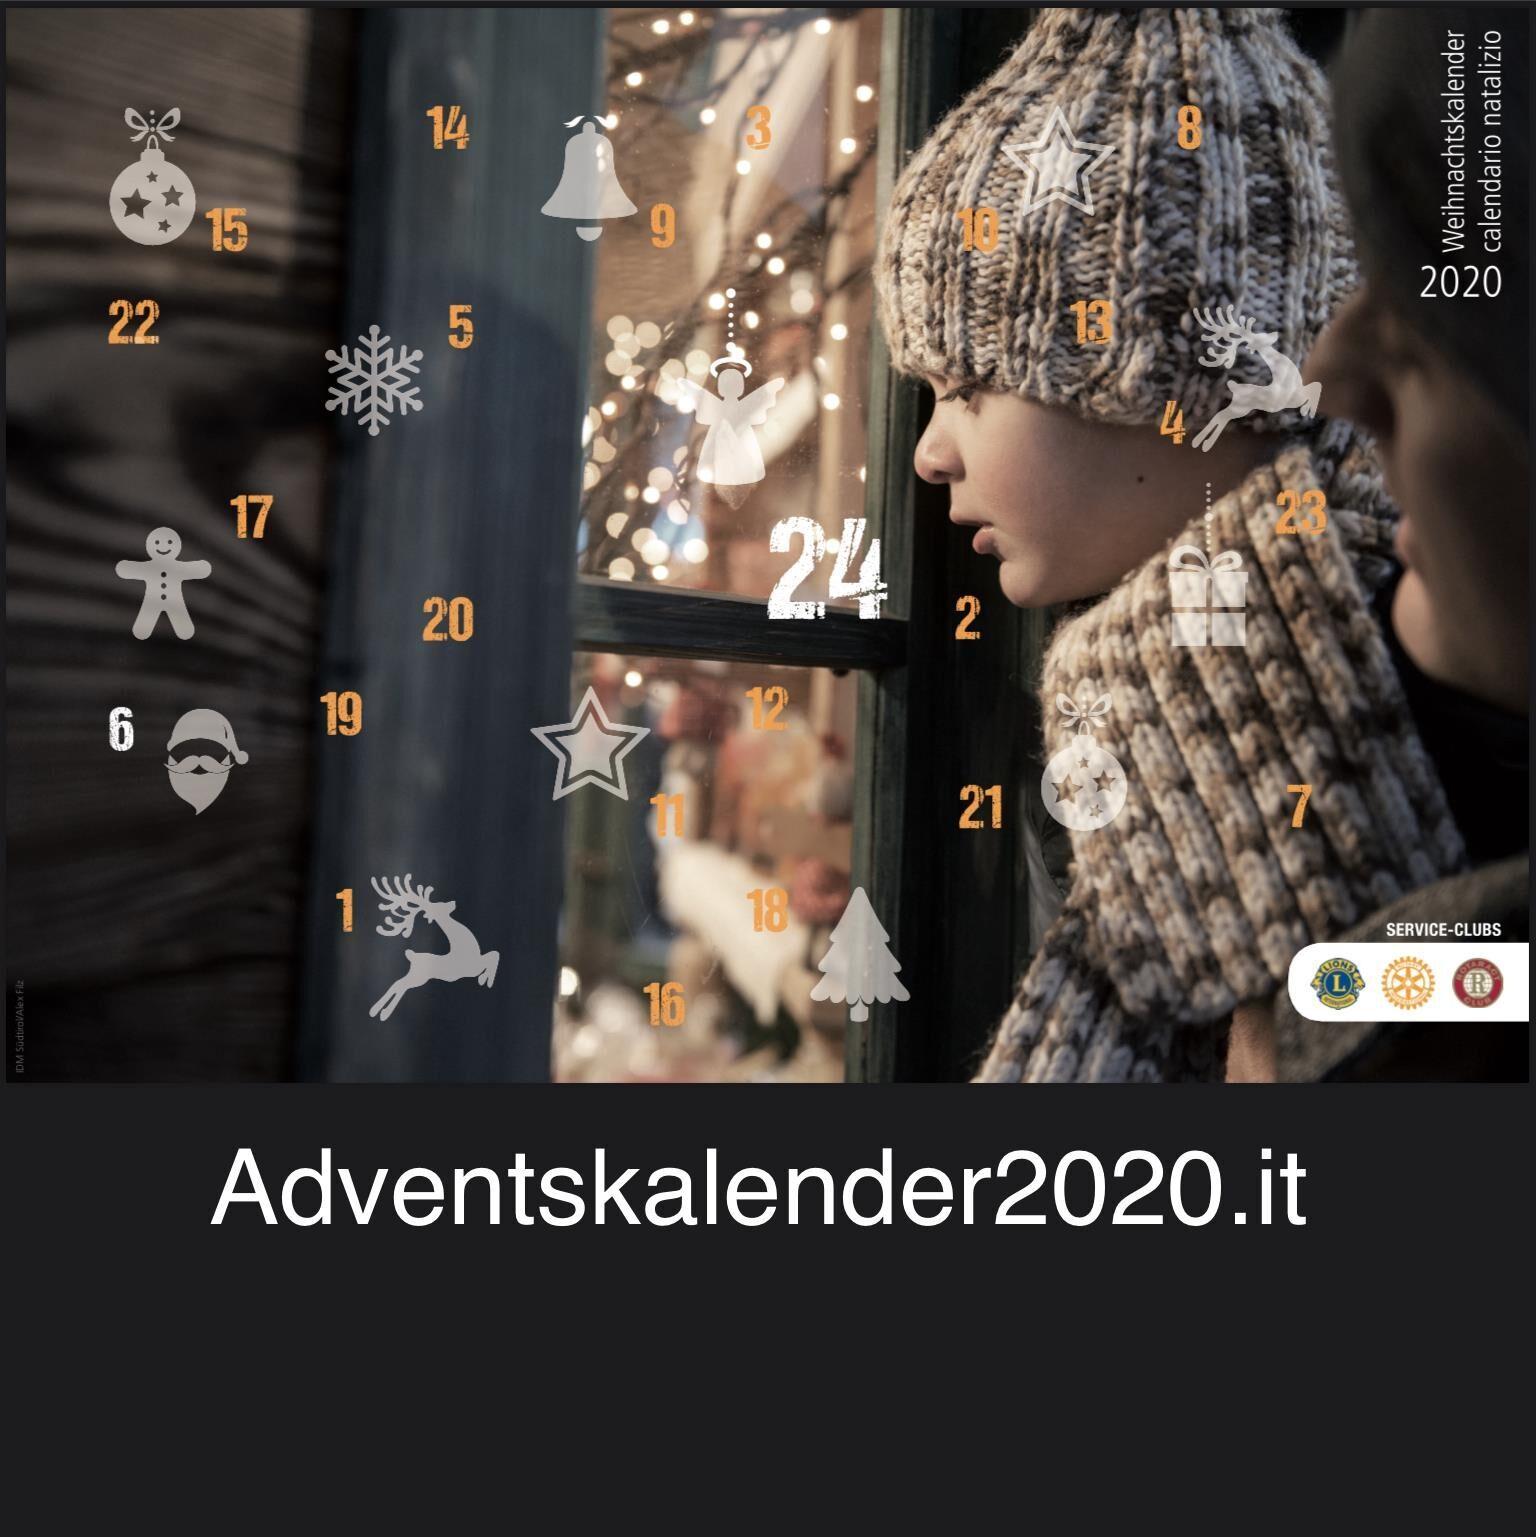 Adventskalender2020.it